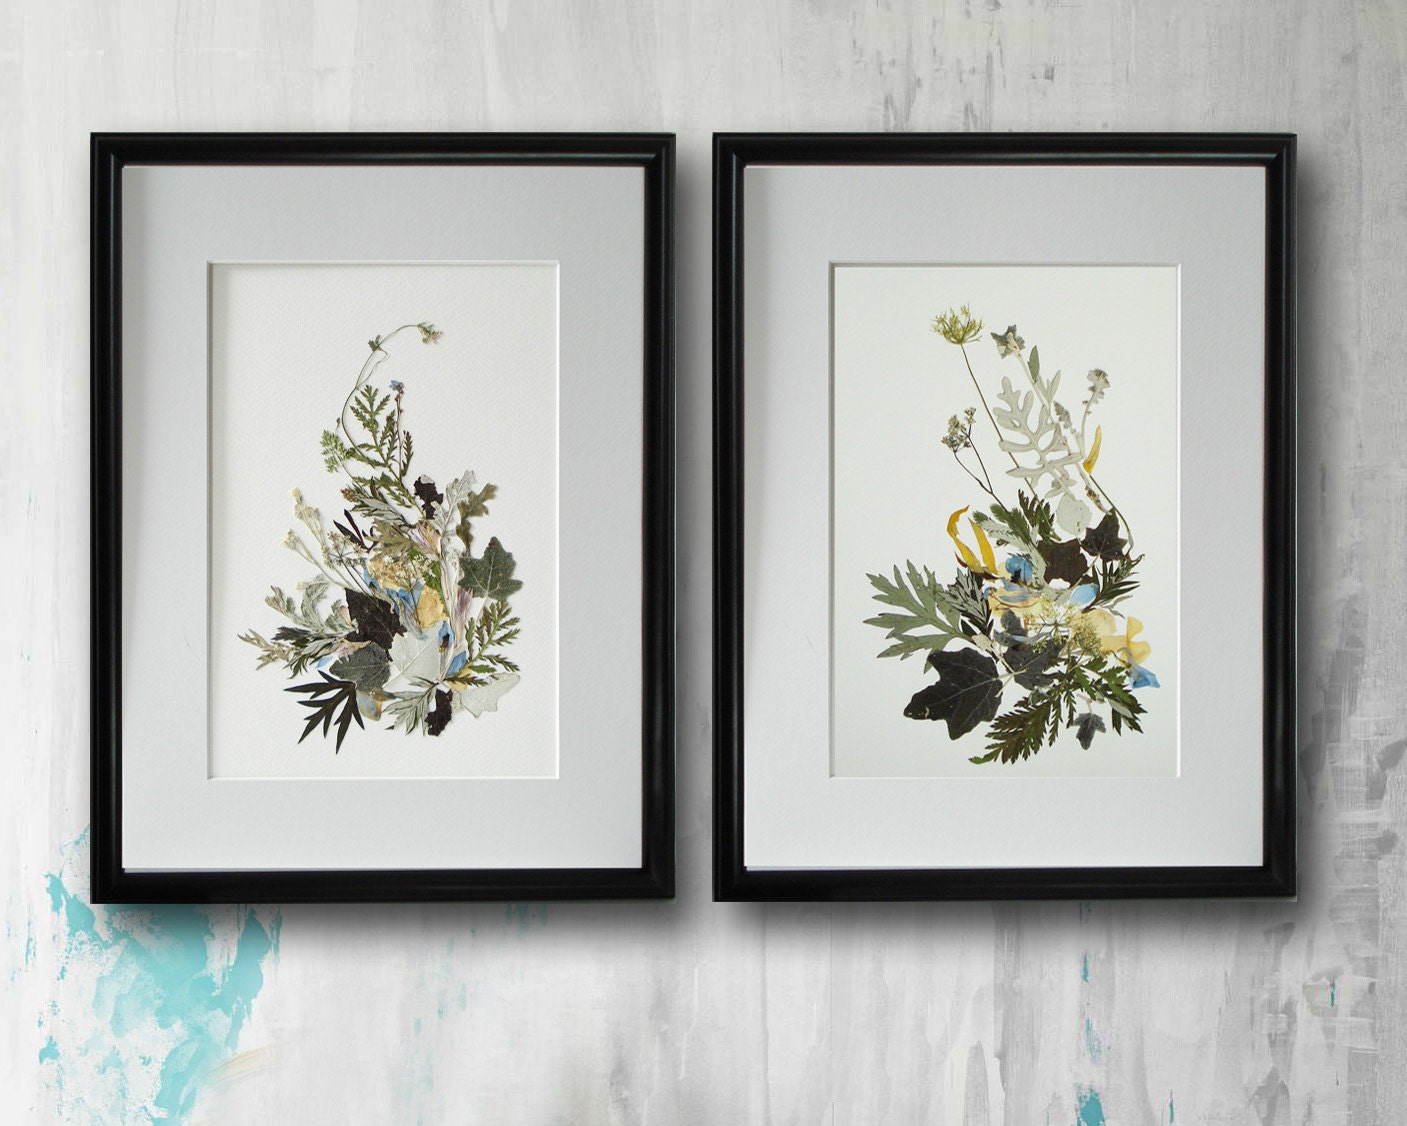 2er Set gerahmt Drucke gepresste Blumen gerahmt Wandkunst   Etsy